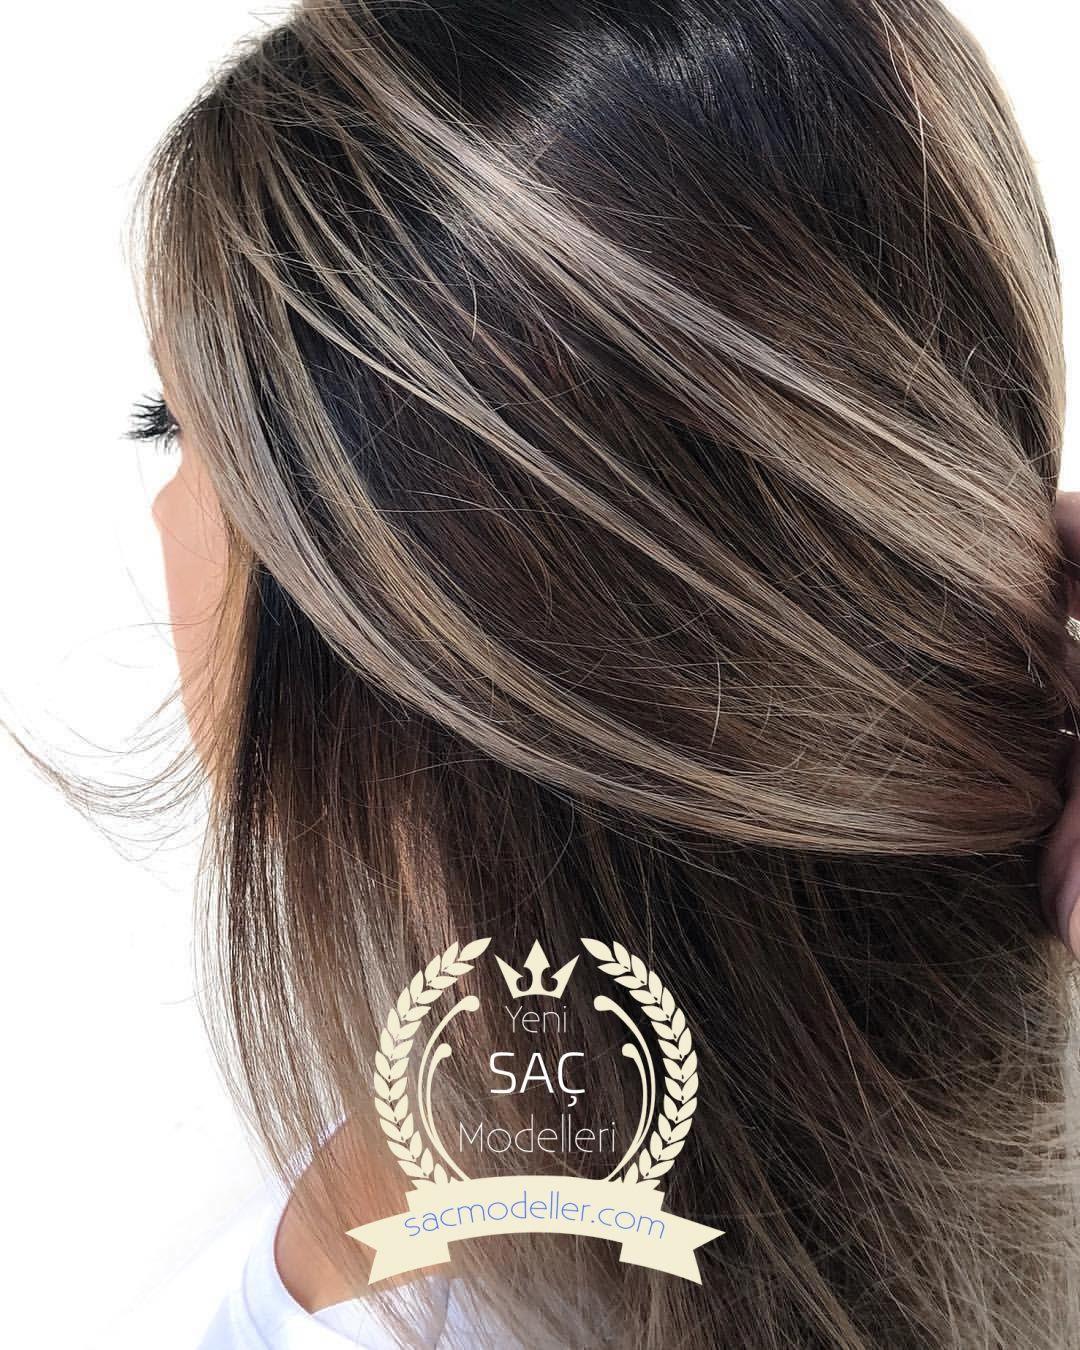 Gri Renk Tonlarinin En Guzel Sac Modelleri Hair Shades Hair